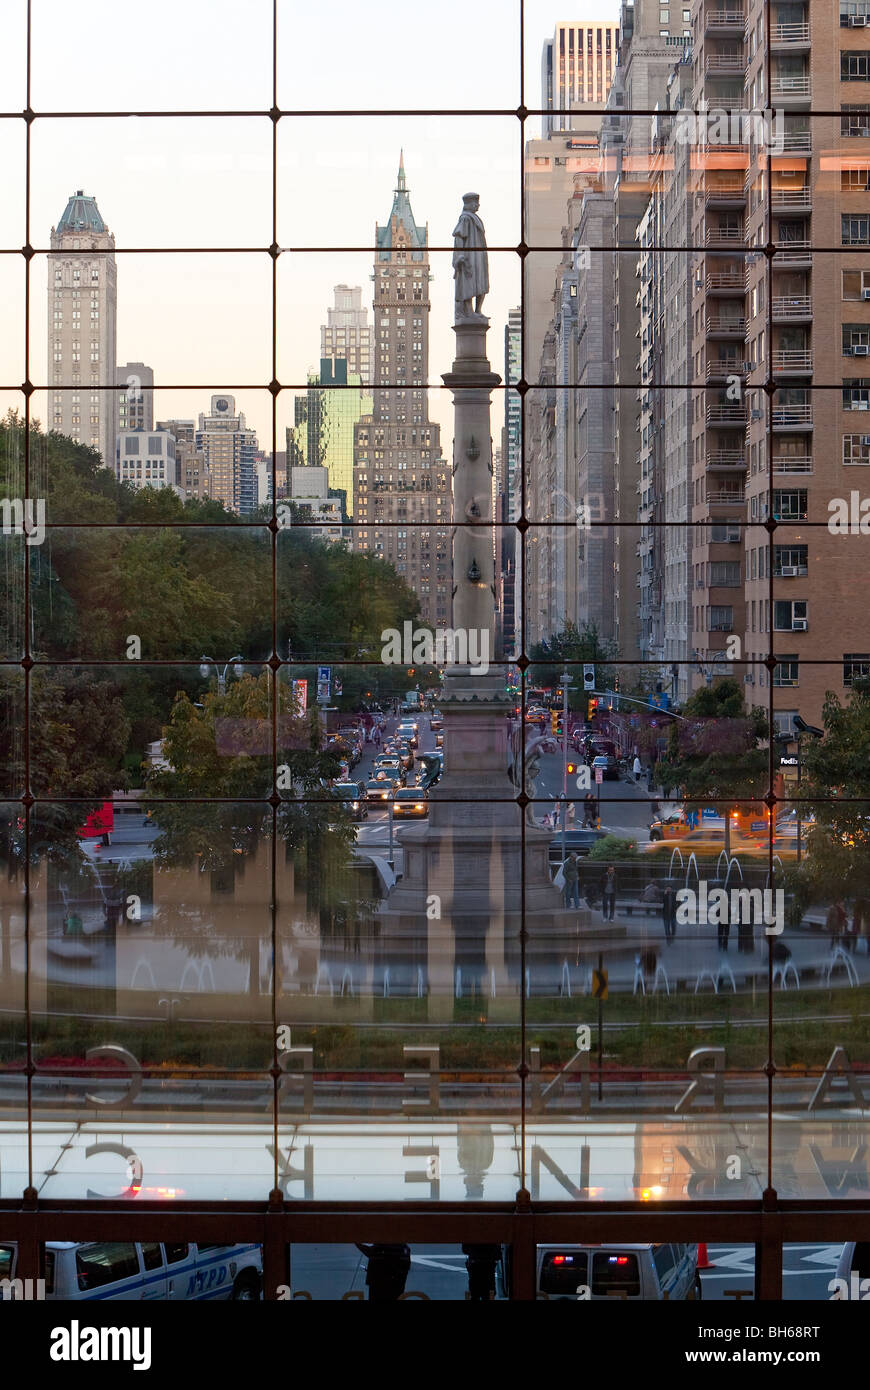 USA, New York City, Manhattan, Statue of Christopher Columbus in Columbus Circle viewed through a glass shopping Stock Photo